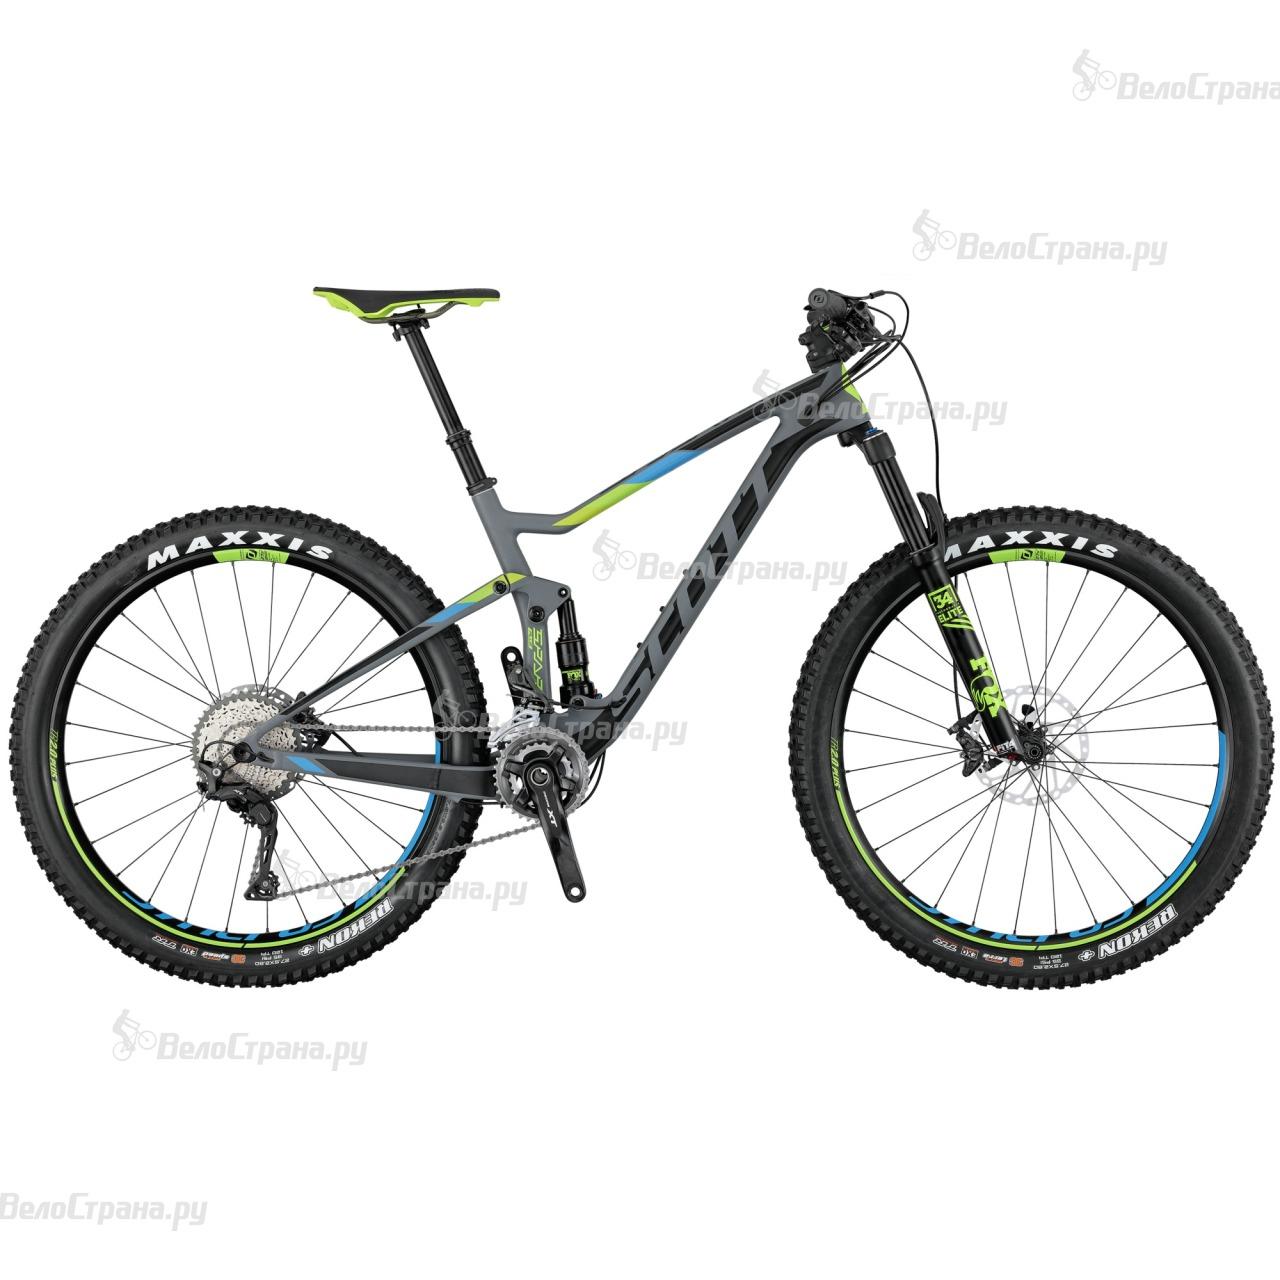 Велосипед Scott Spark 710 Plus (2017)